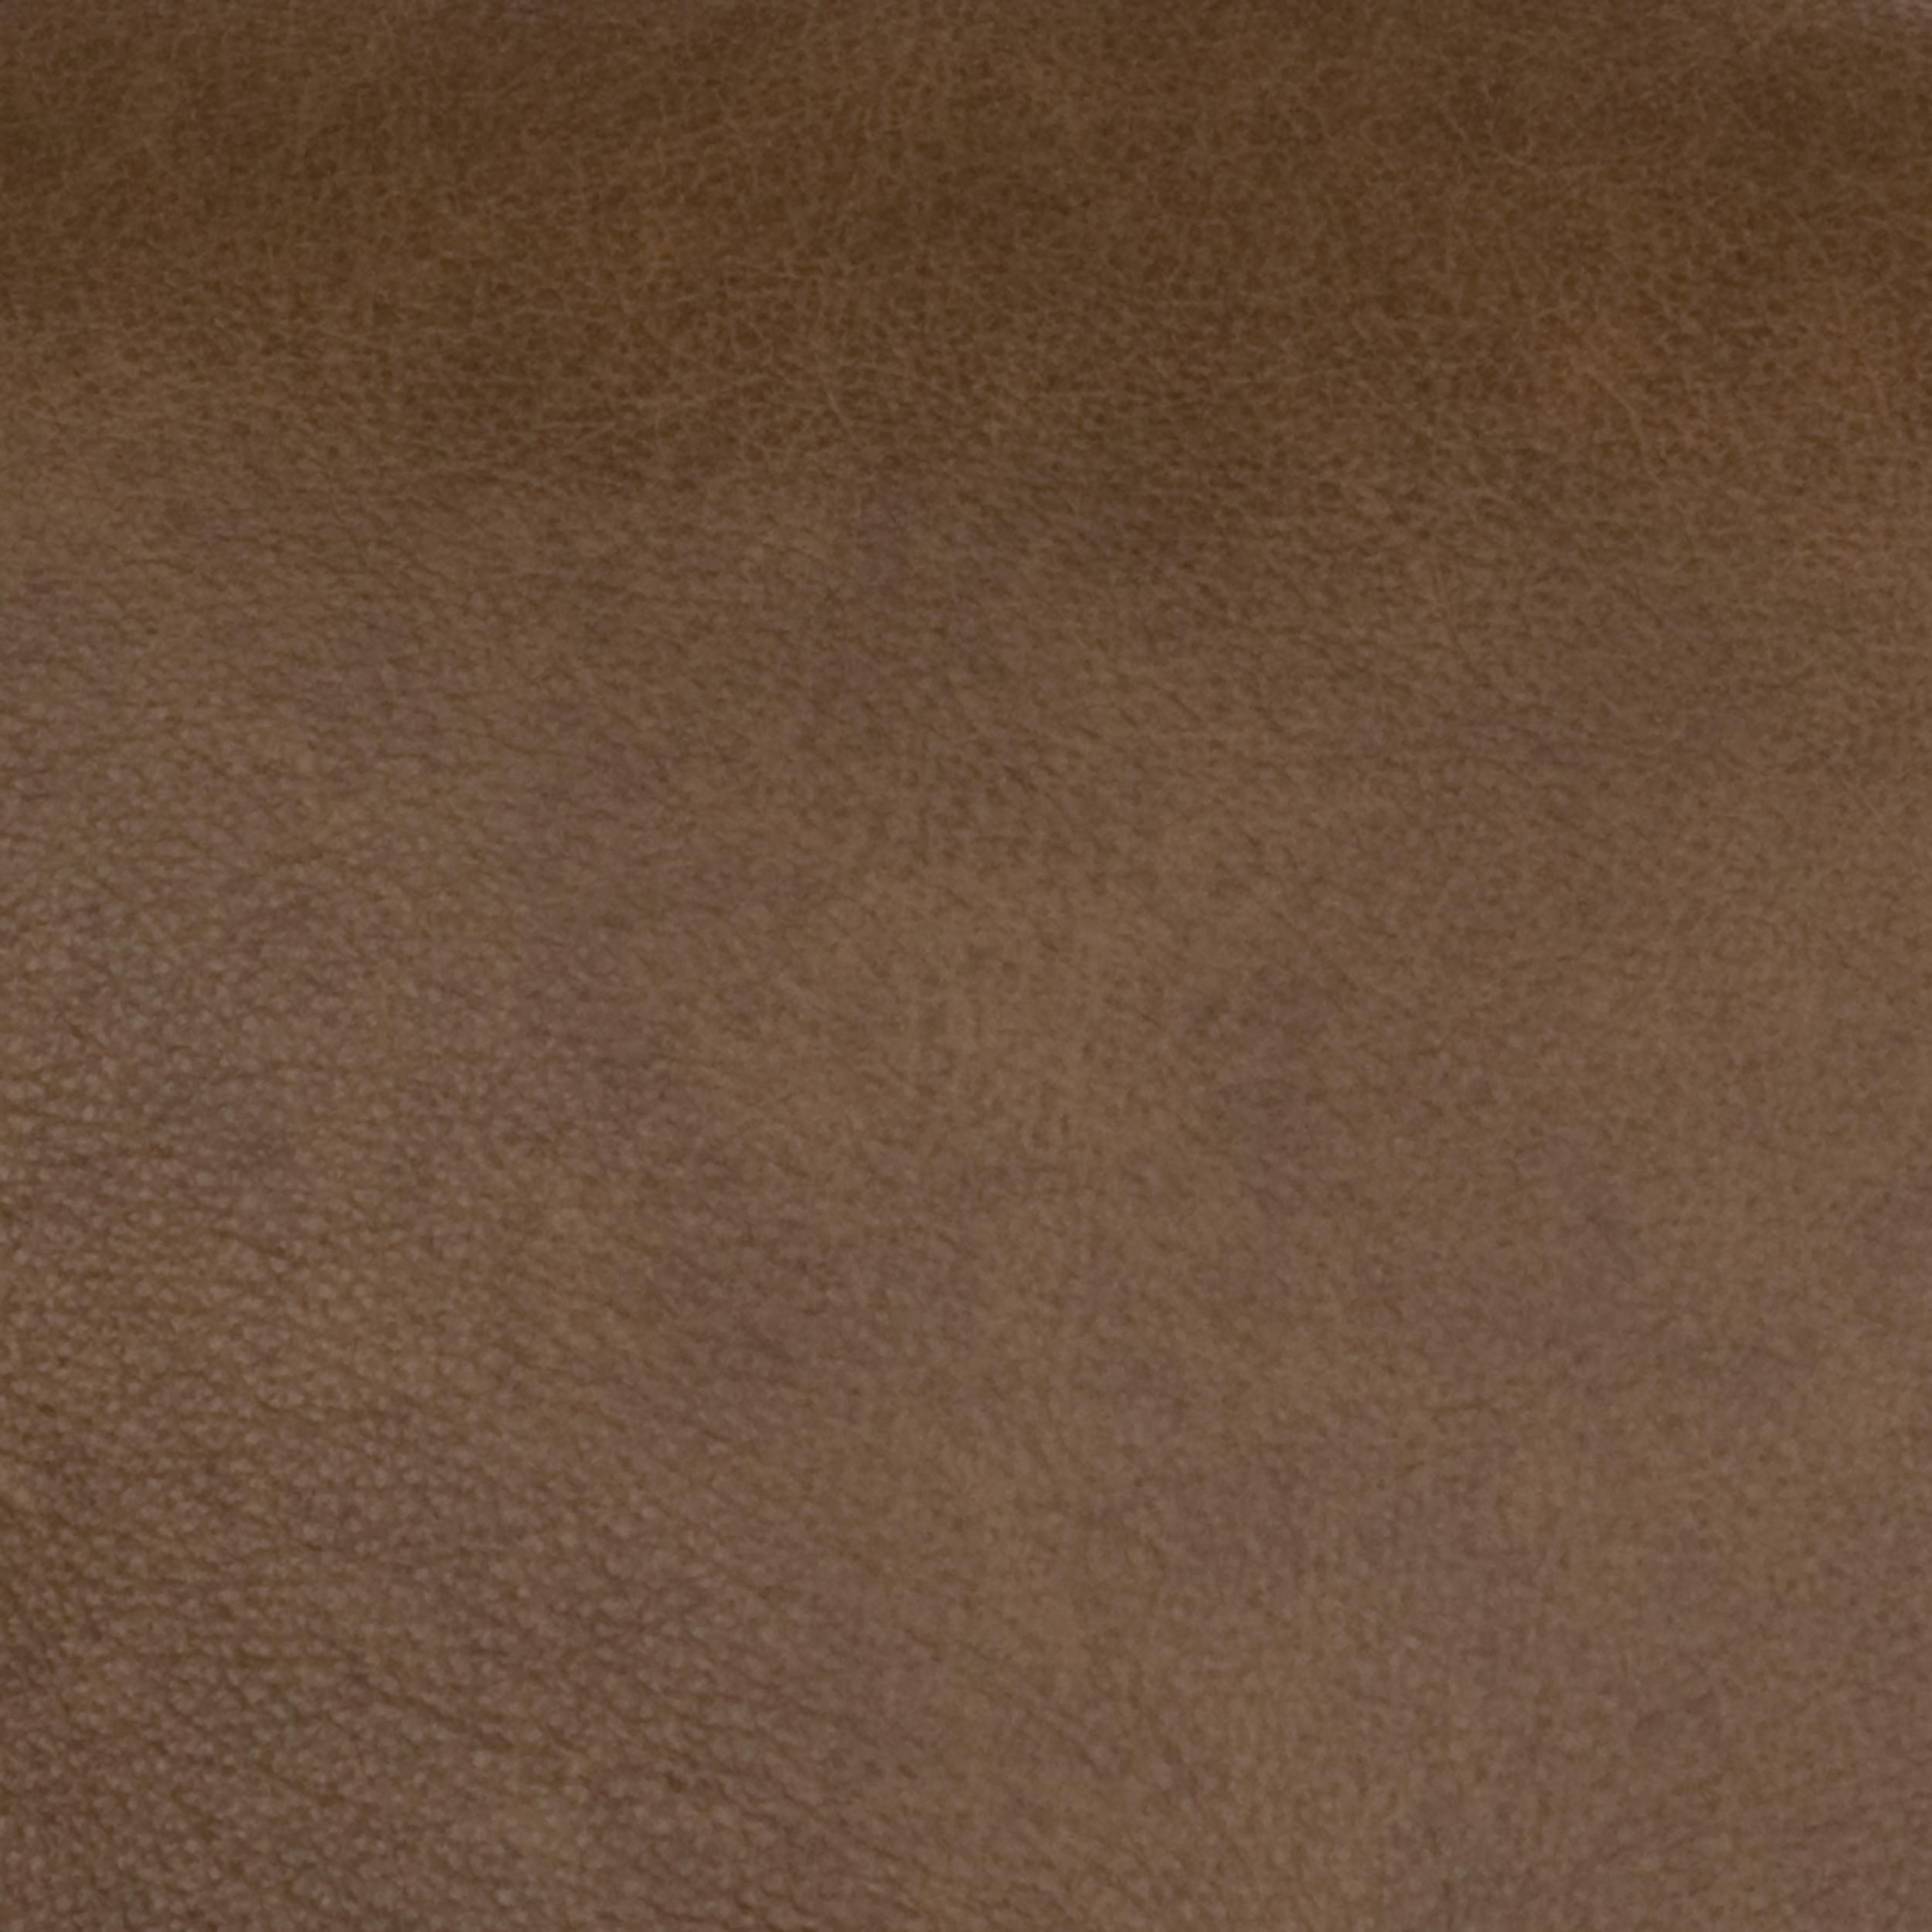 Caribou Leather